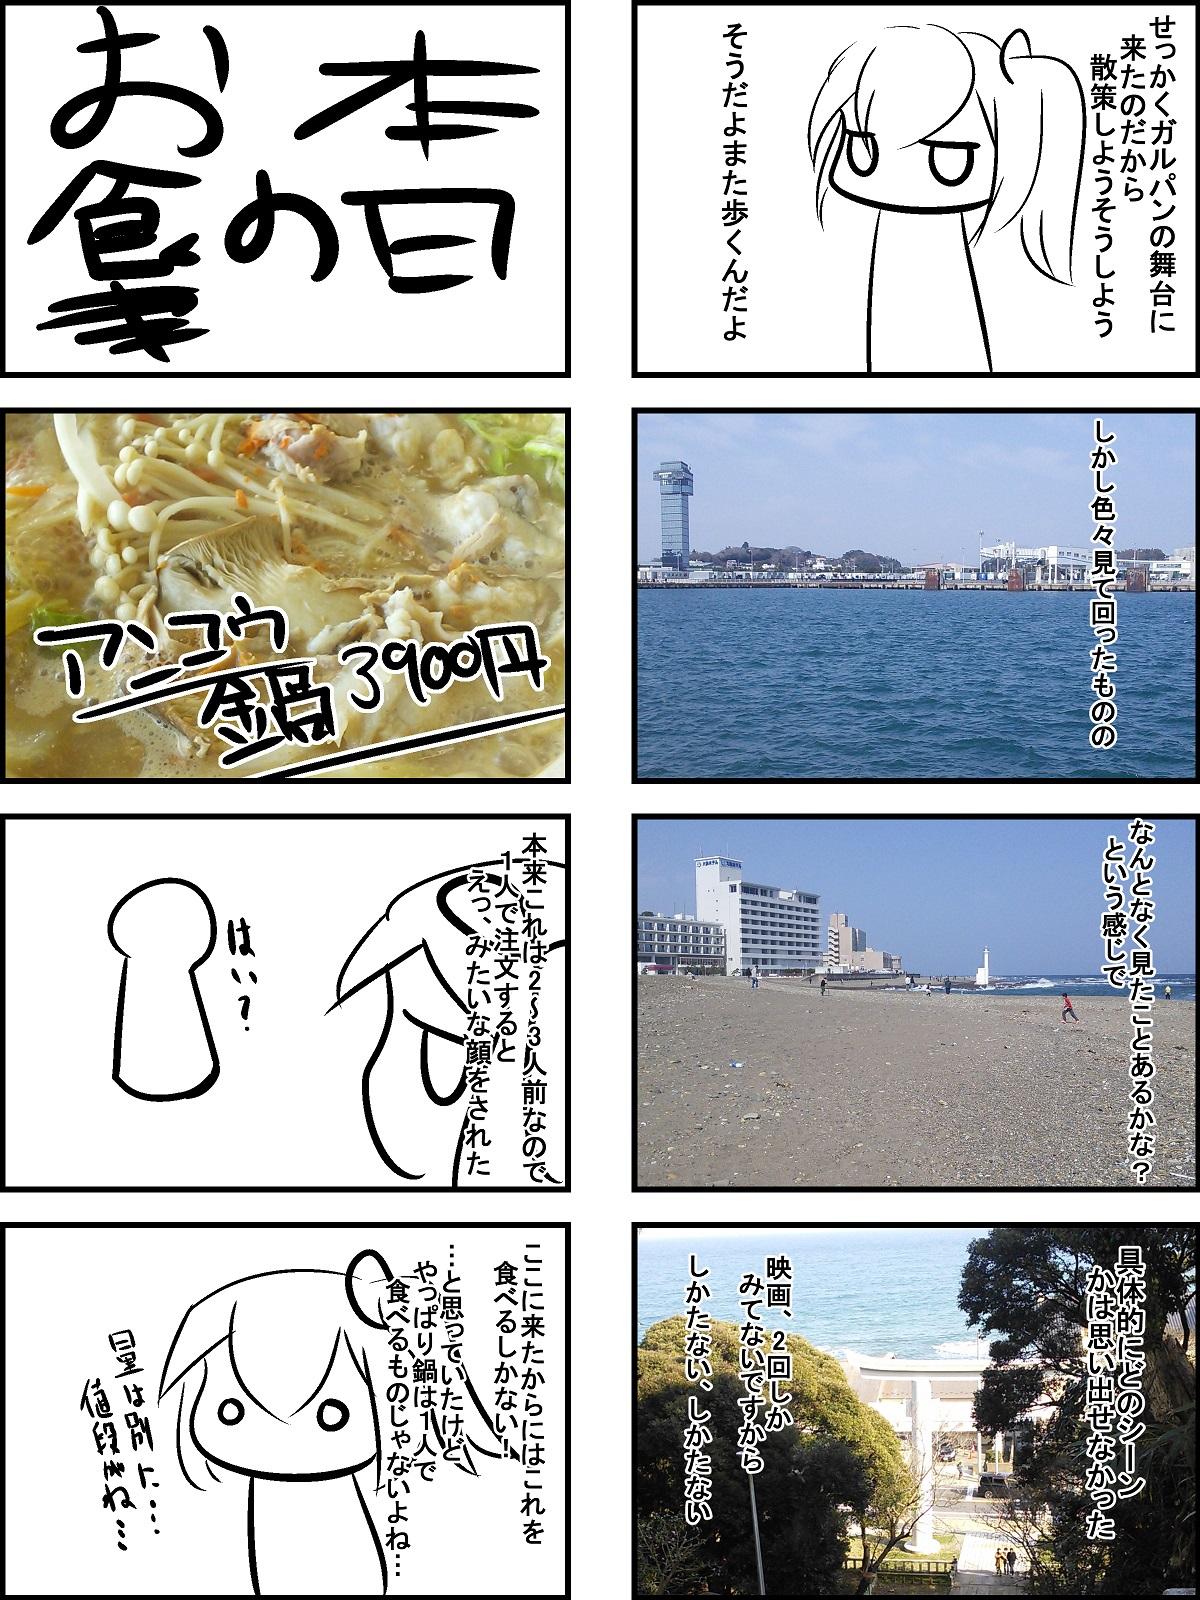 blog-2016320c.jpg